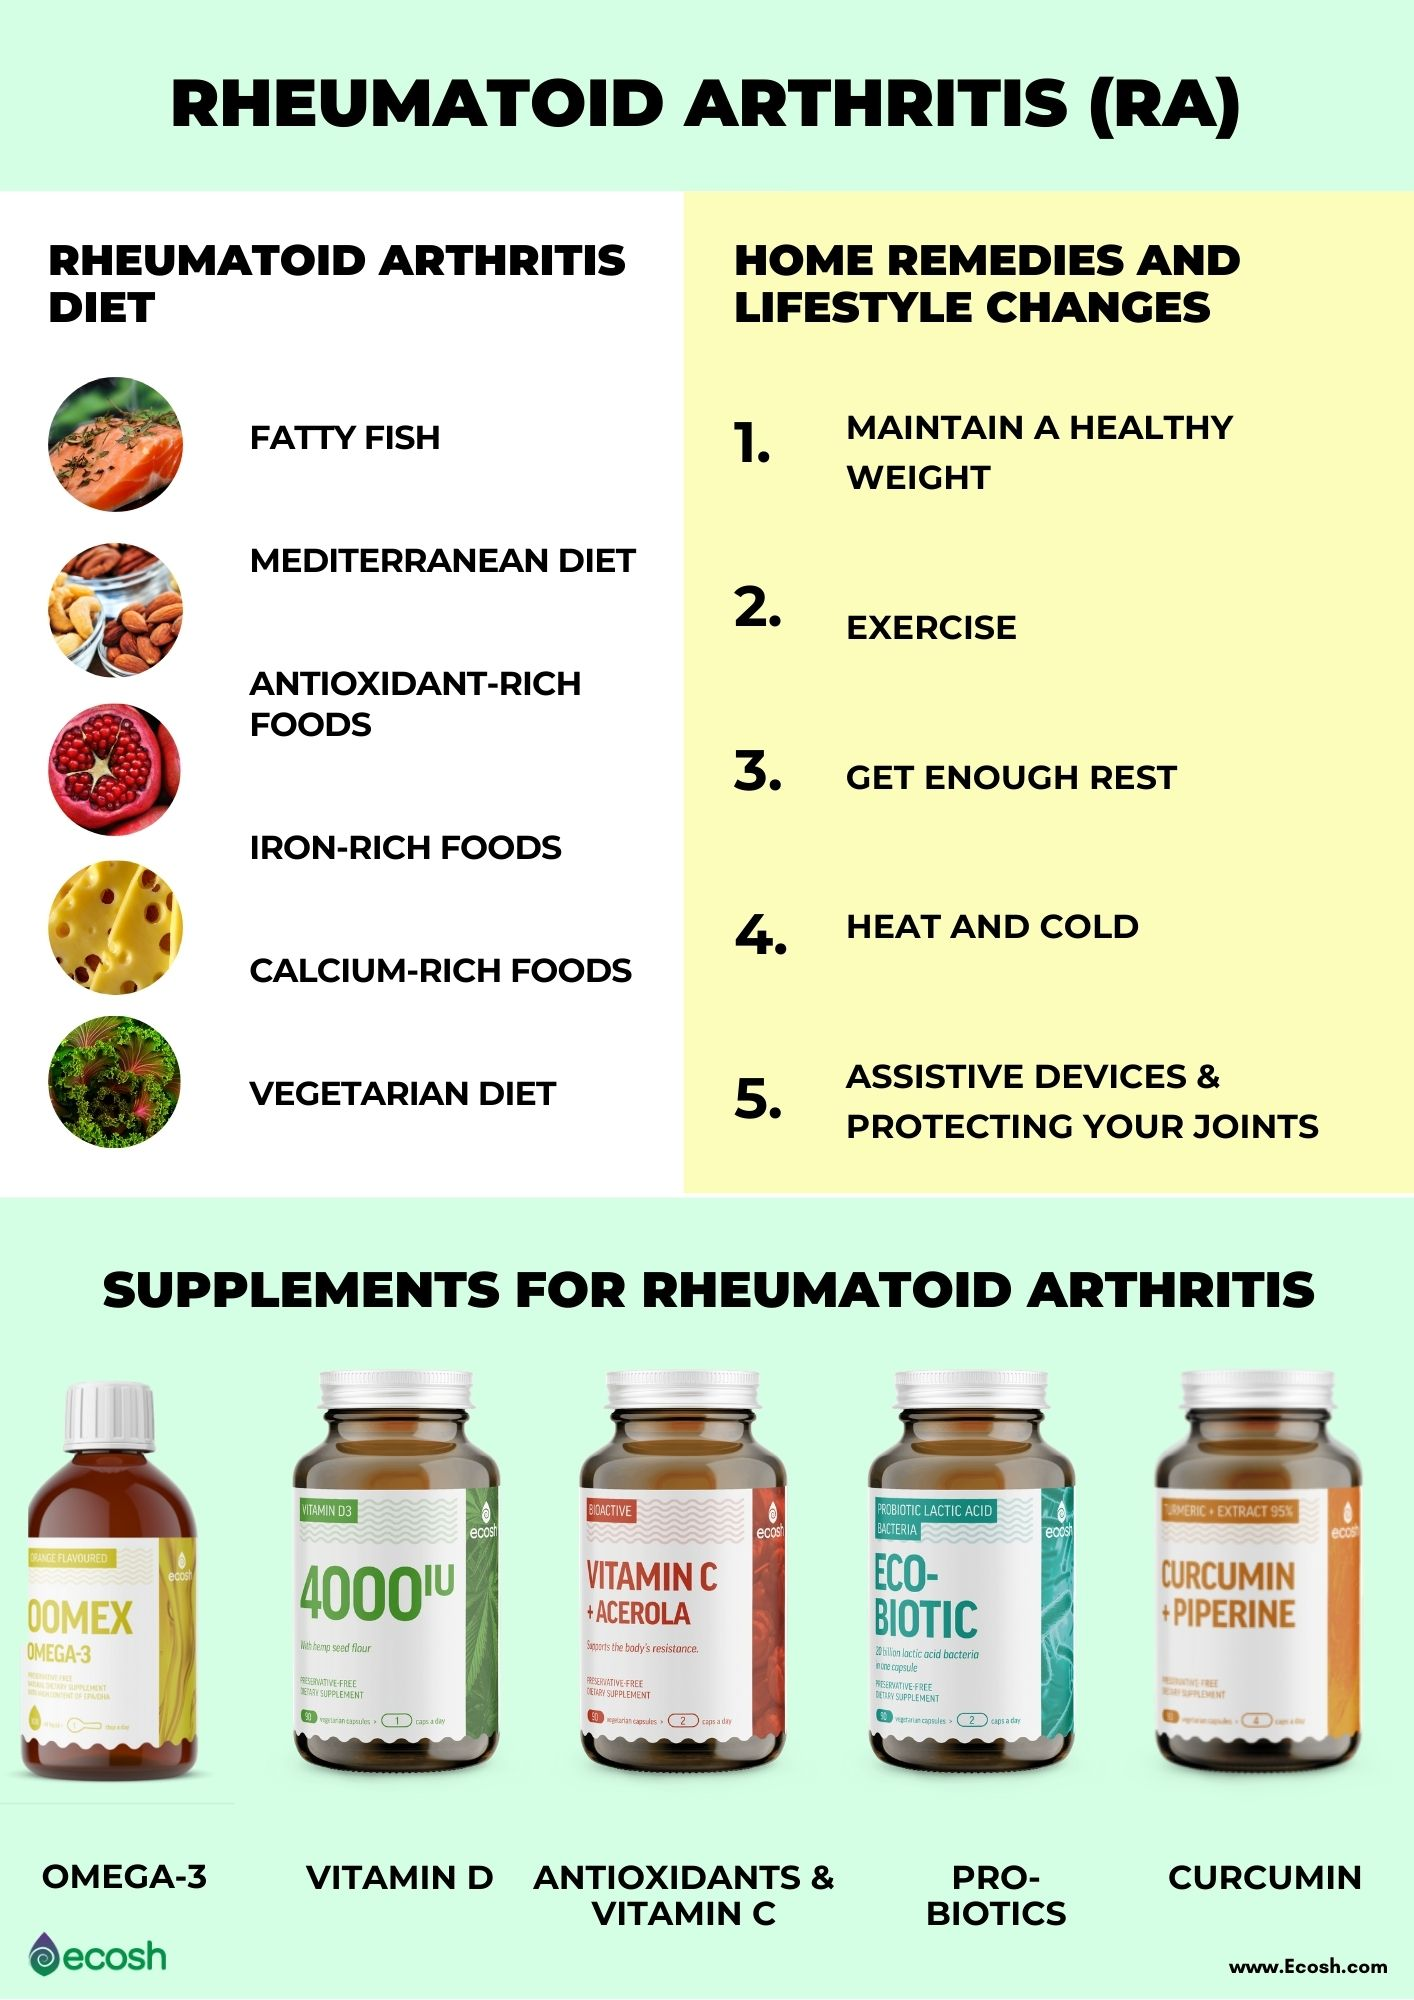 Ecosh_Rheumatoid_Arthritis_Diet_Home_Remedies_for_Rheumatoid_Arthritis_Supplements_for_Rheumatoid_Arthritis_Rheumatoid_Arthritis_Home_Treatment_Rheumatoid_Arthritis_Diet_Rich_in_Omega_3_